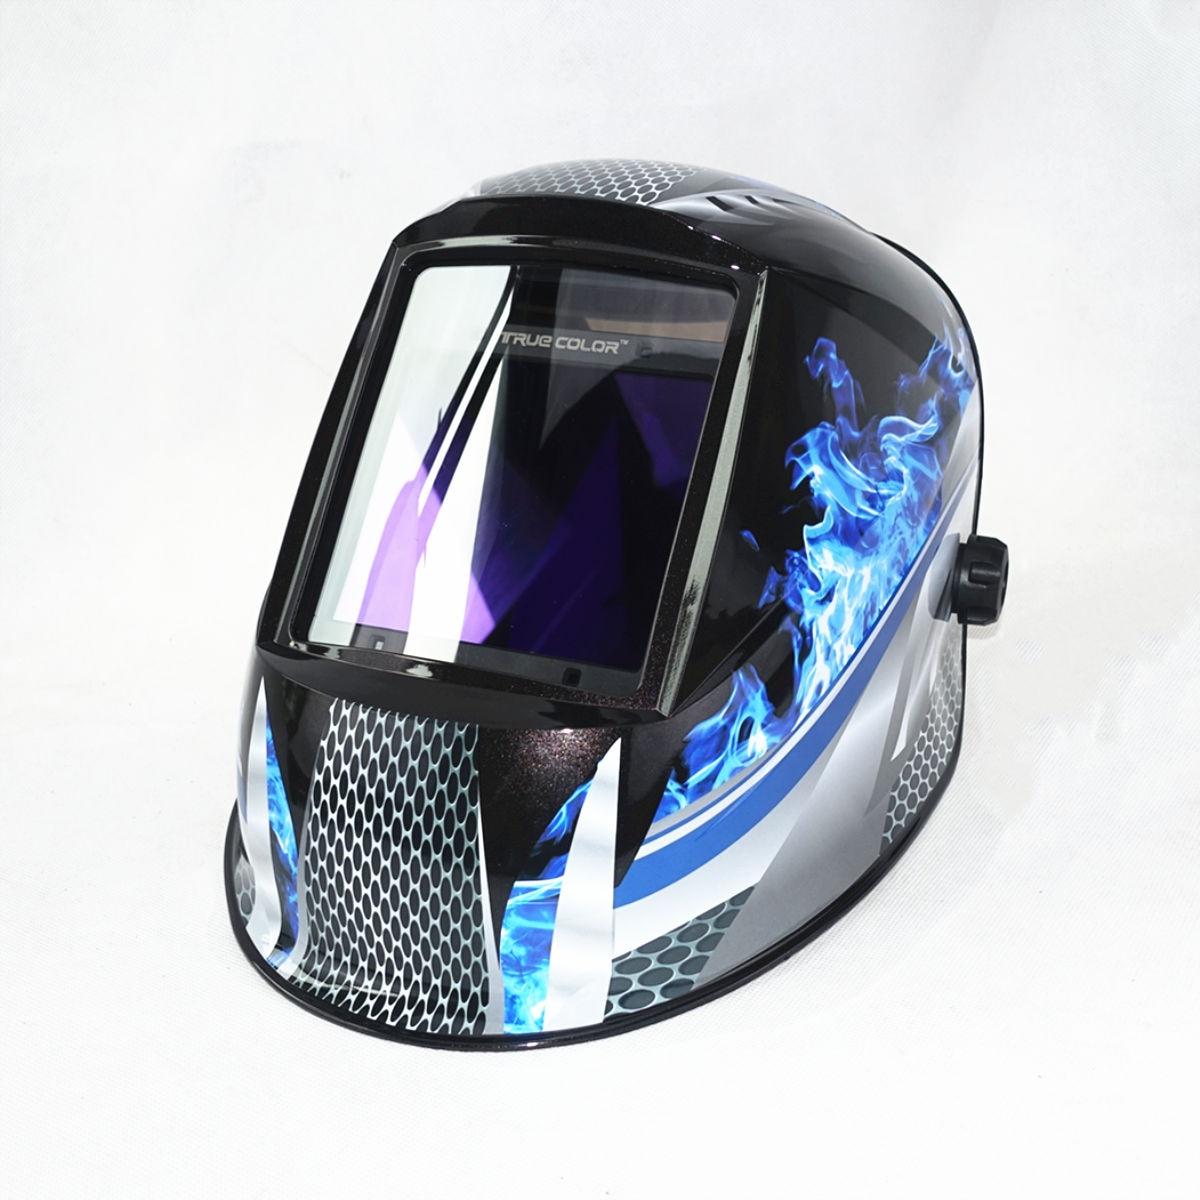 "Auto Darkening Welding Helmet View Size 98x88mm 3.86x2.46"" DIN 4-13 4 Sensors CE EN379 Welding Mask"